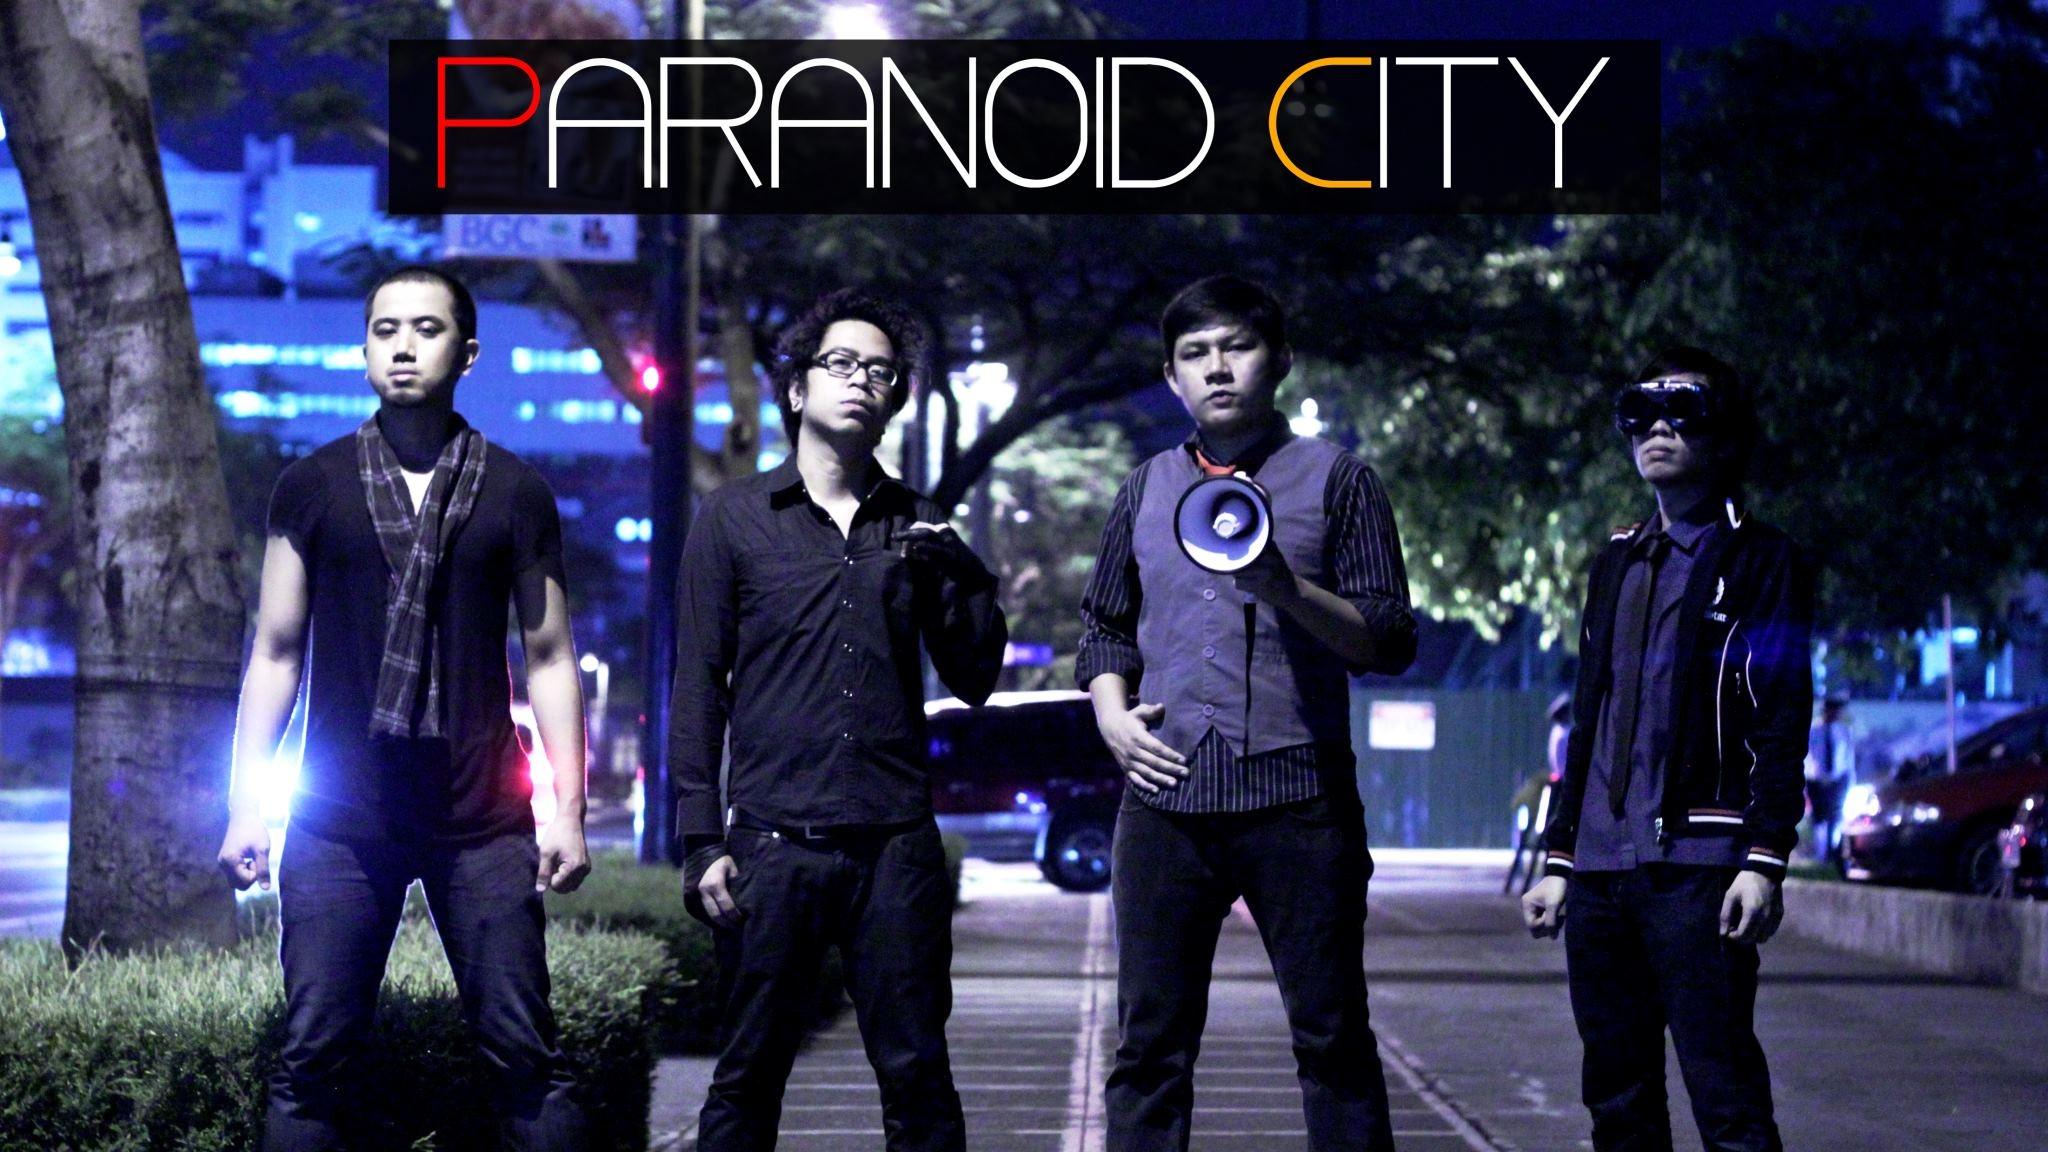 Paranoid City (Philippines)